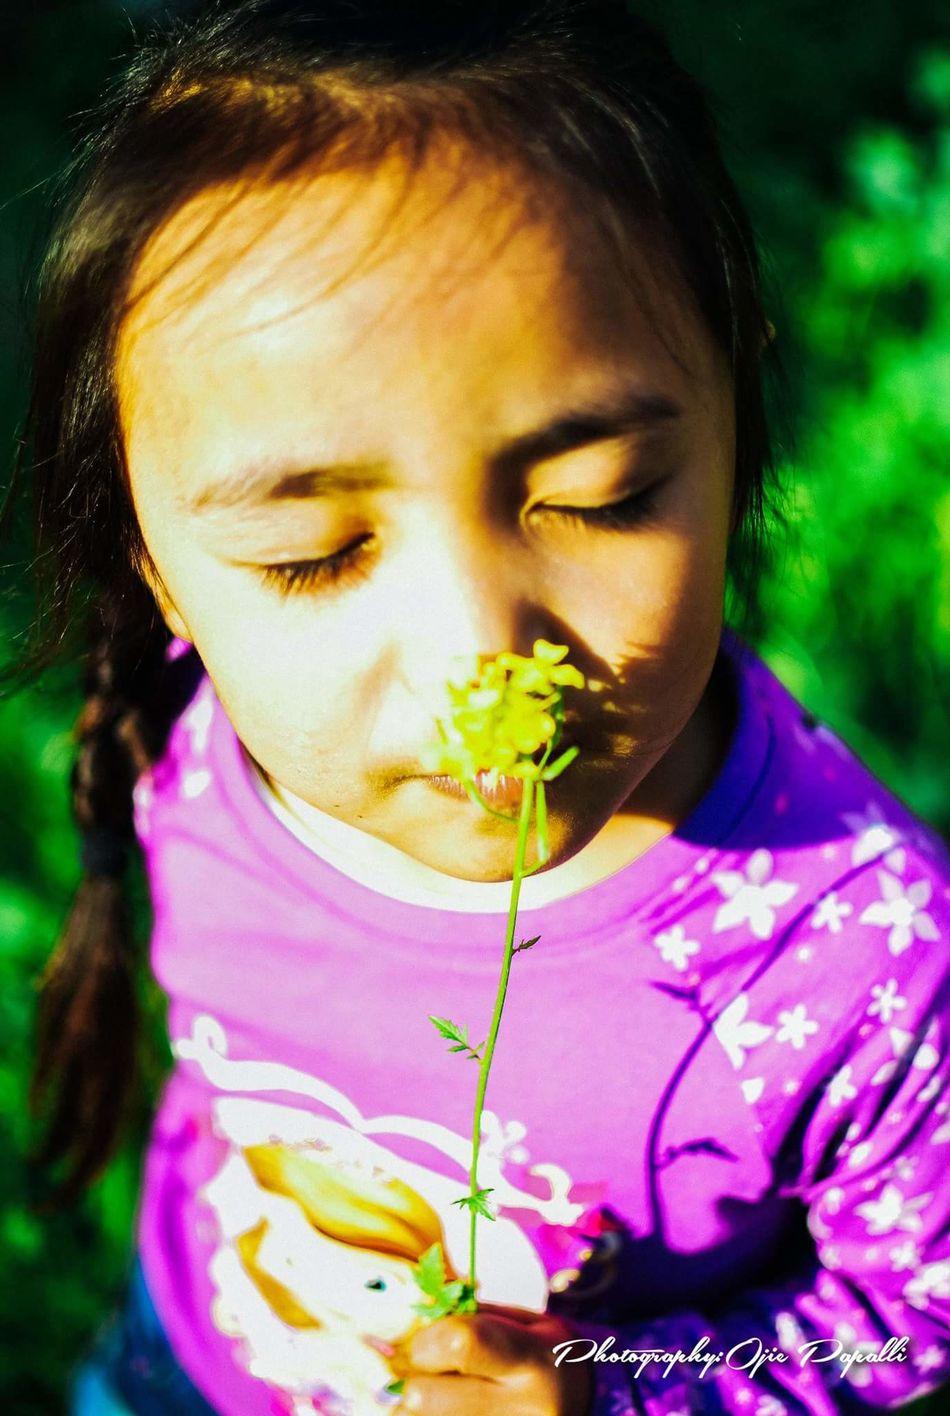 Kidsportrait Portrait Outdoors Close-up Cyprus Happysundays